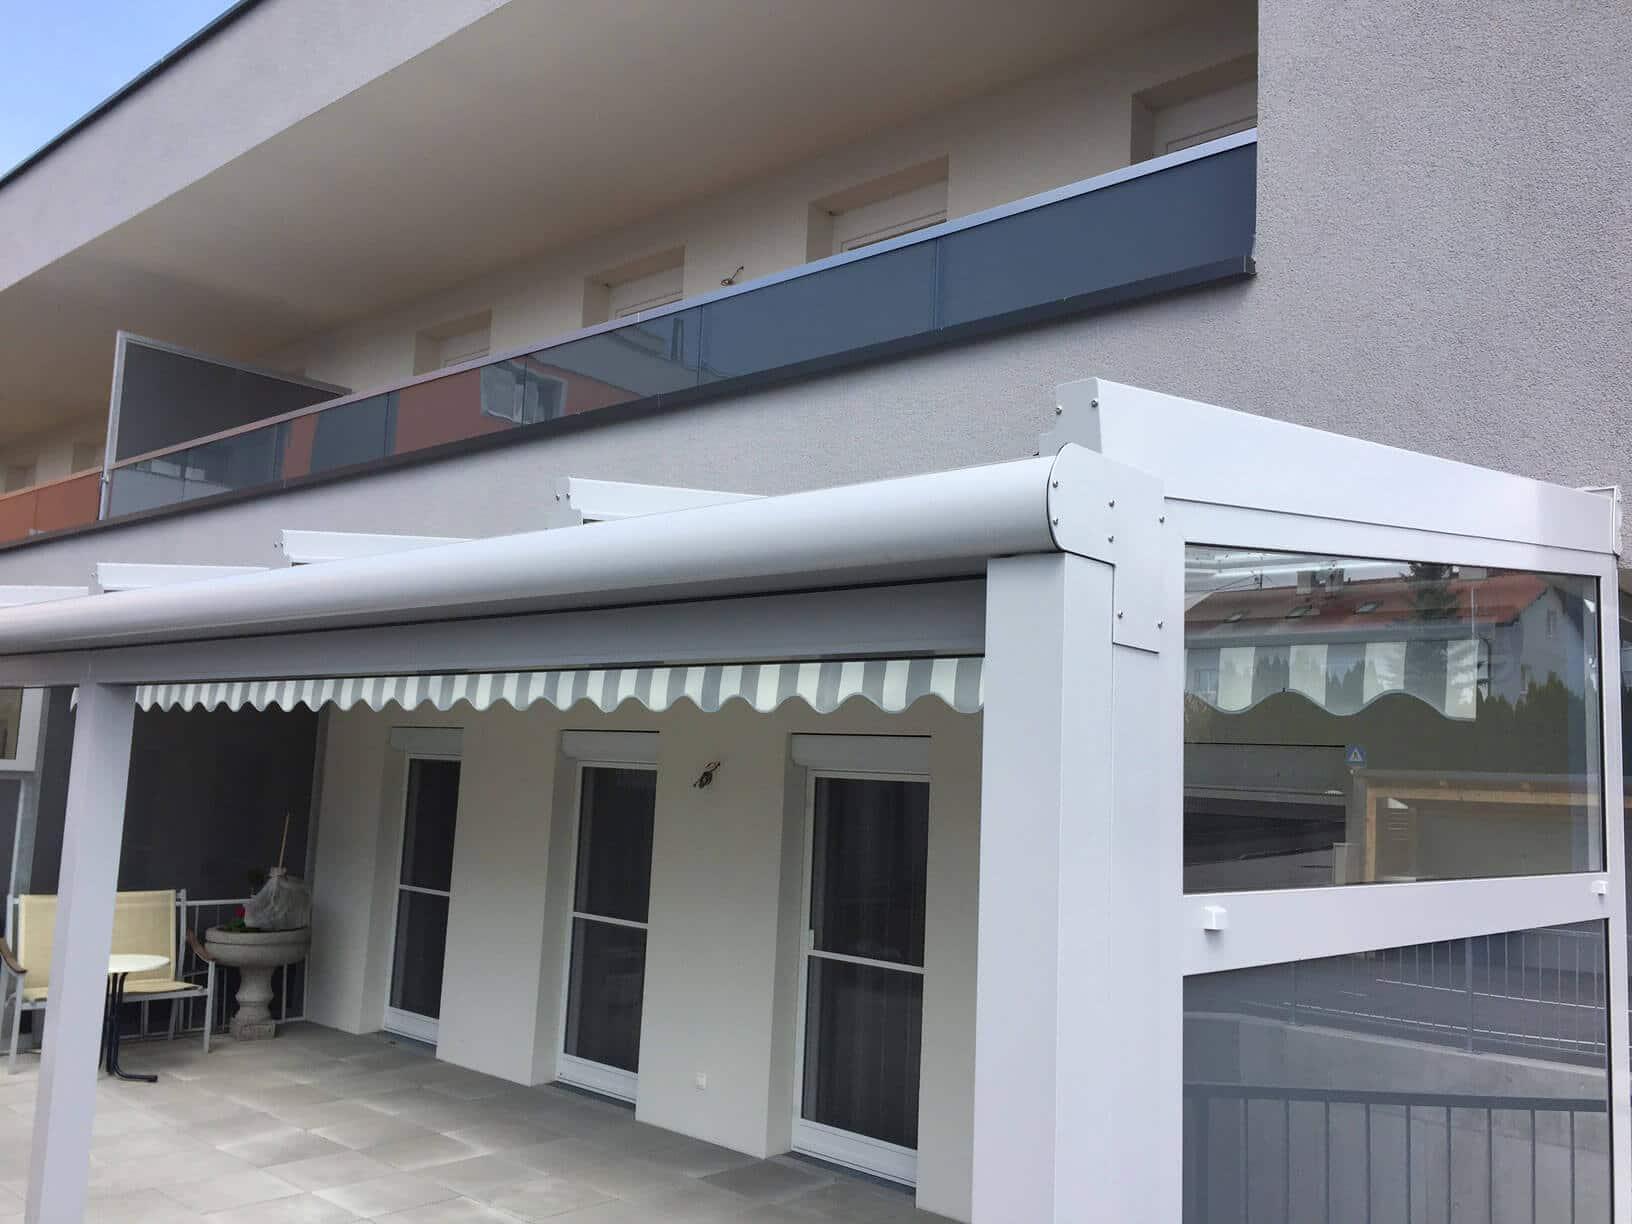 Hochwertige Terrassenüberdachung in grau